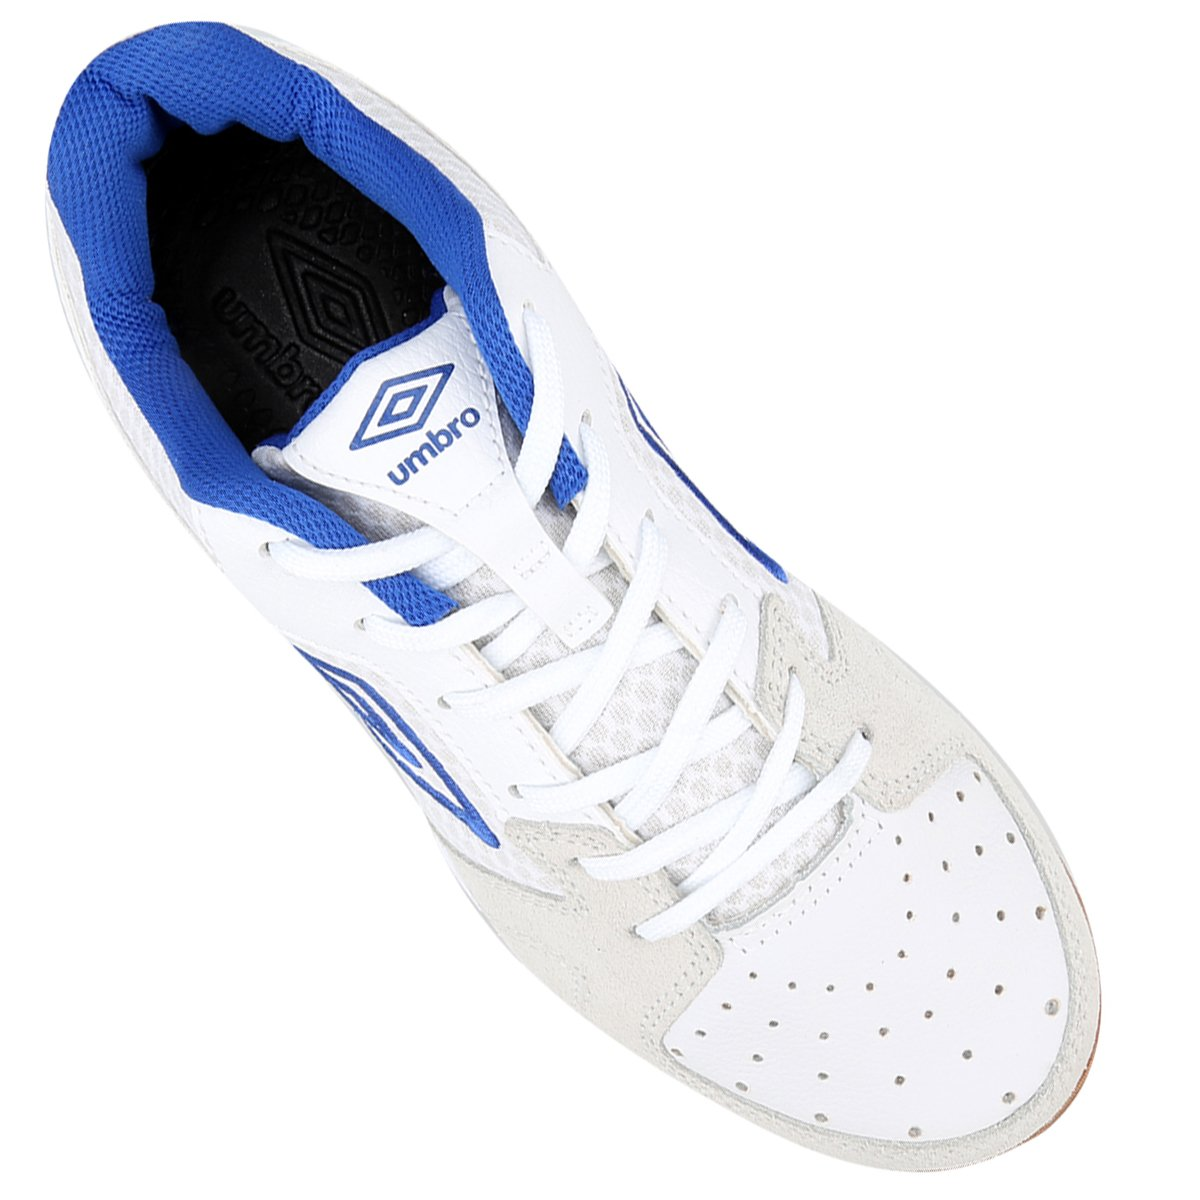 3daa66677b ... Chuteira Umbro Pro 3 Futsal - Branco e Azul - Compre Agora Netshoes  a52938f81251b2 ...